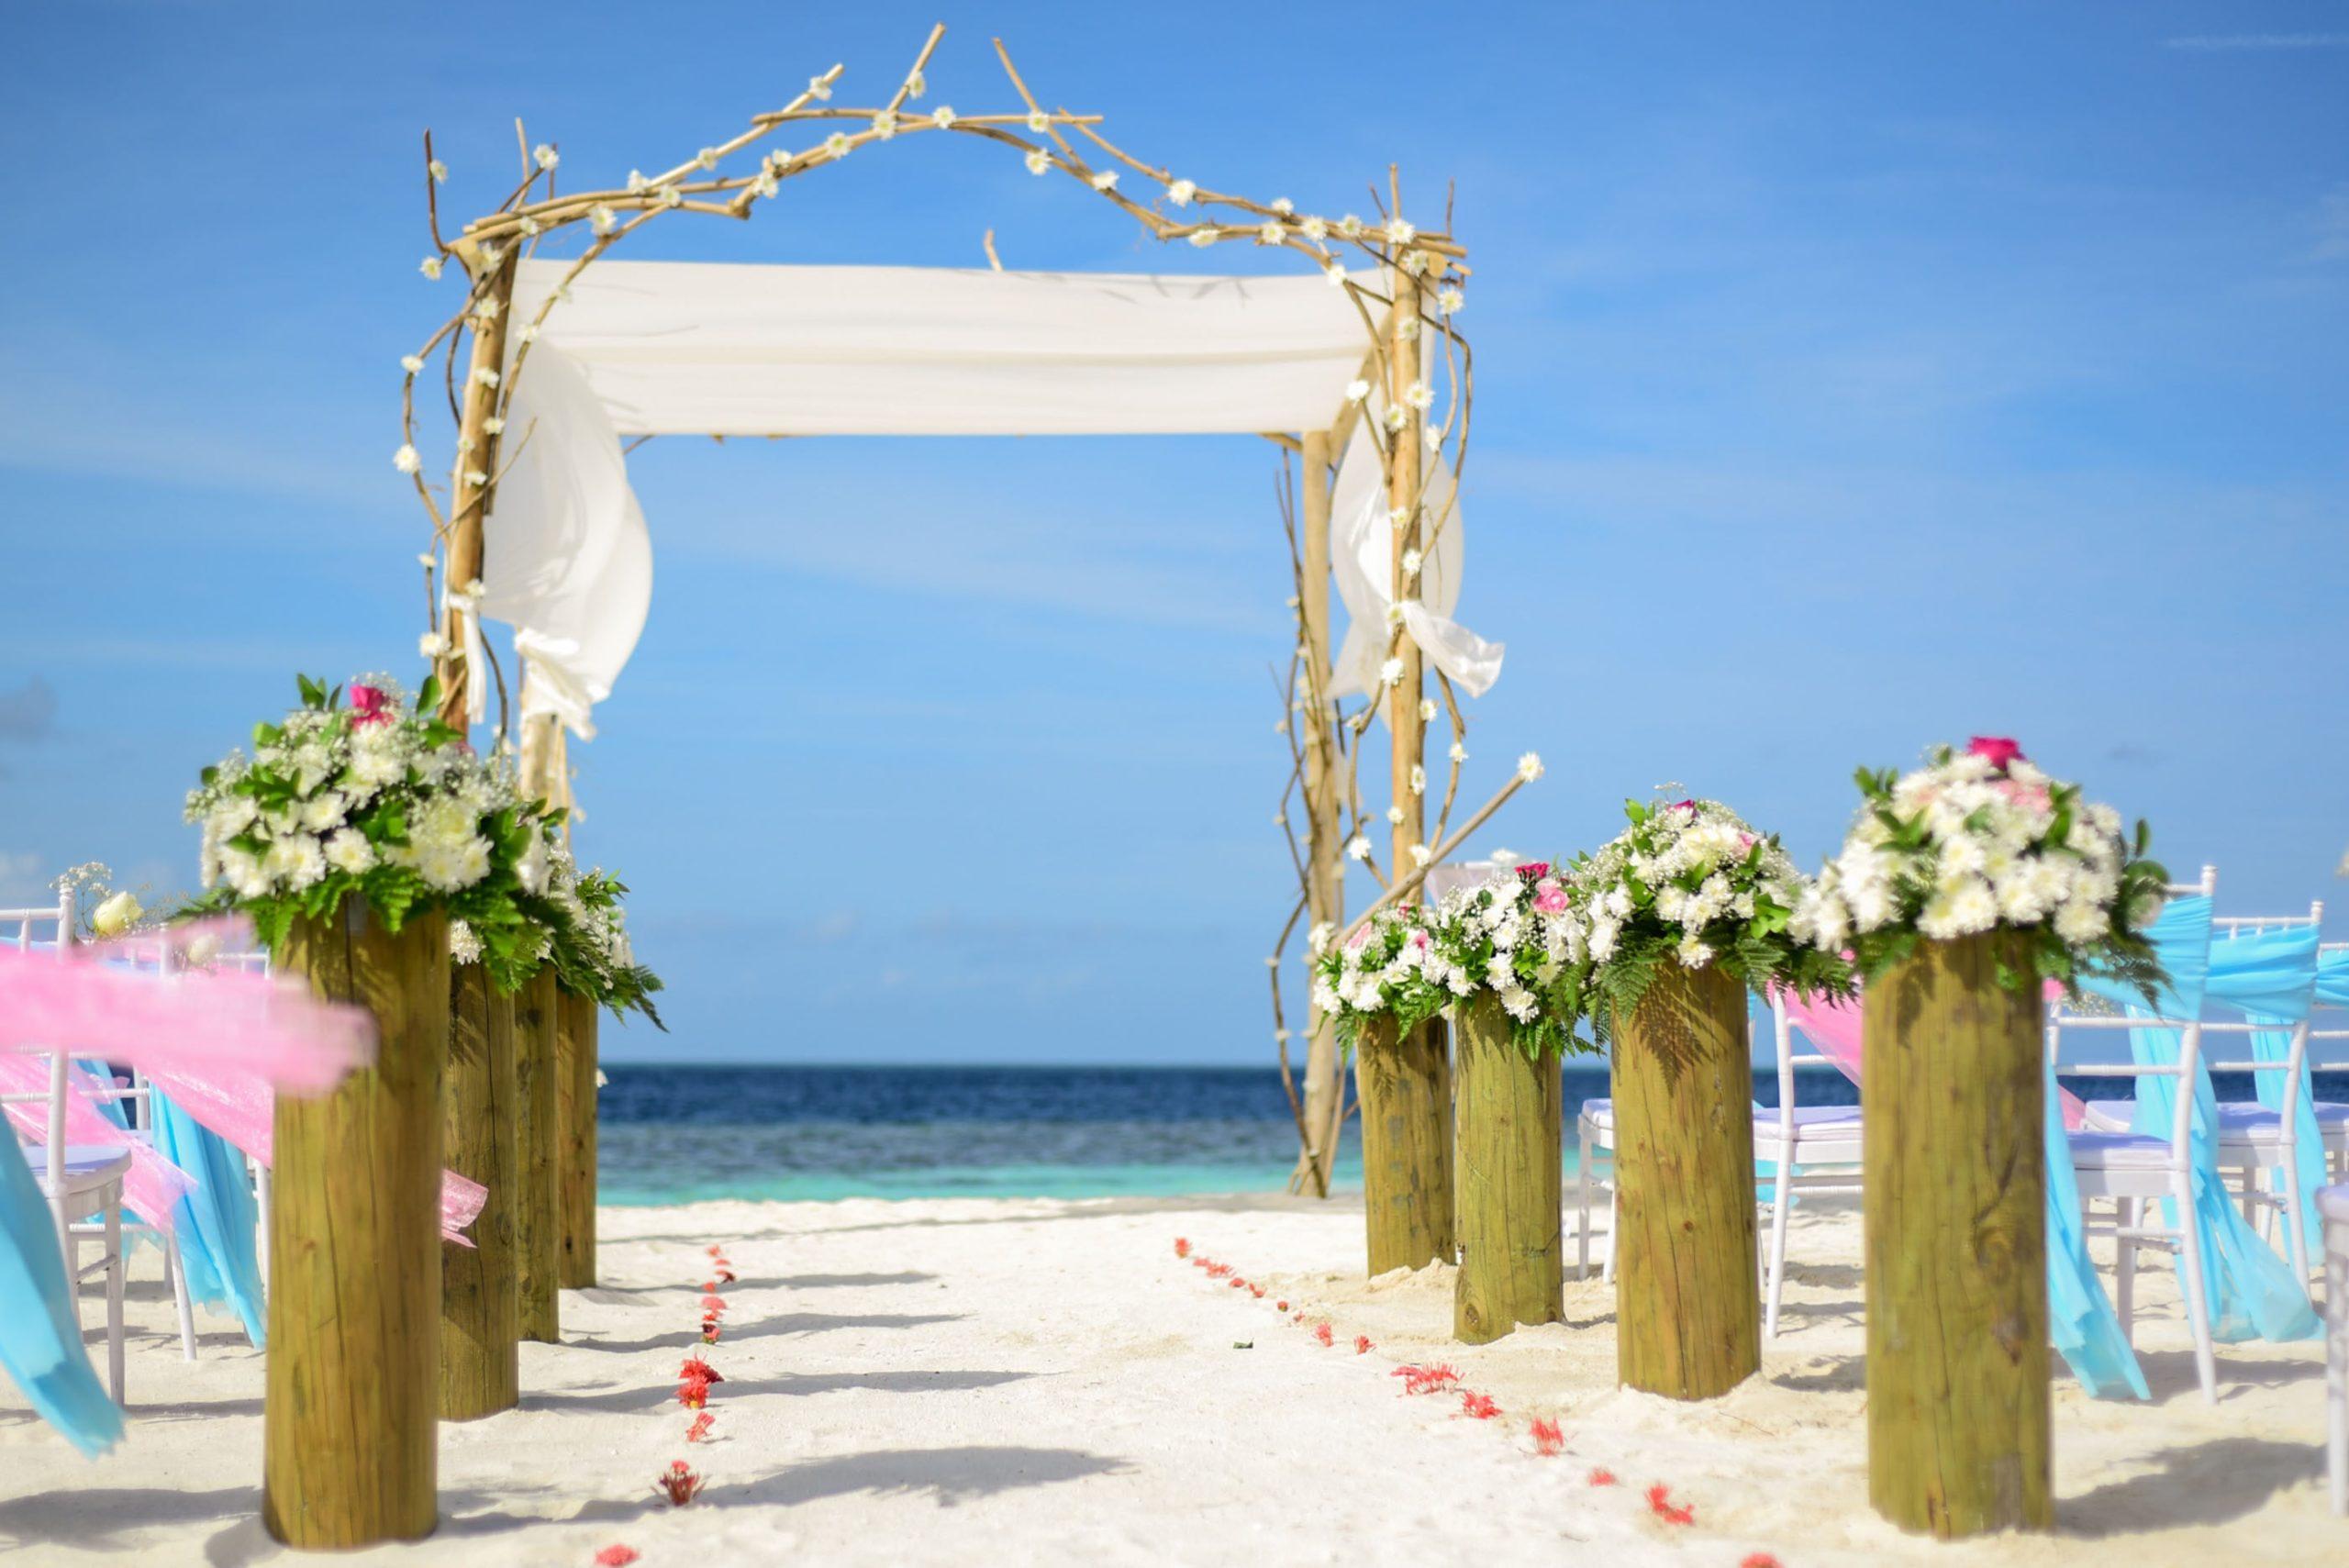 Top 4 Ideas For Diy Rustic Wedding Decor